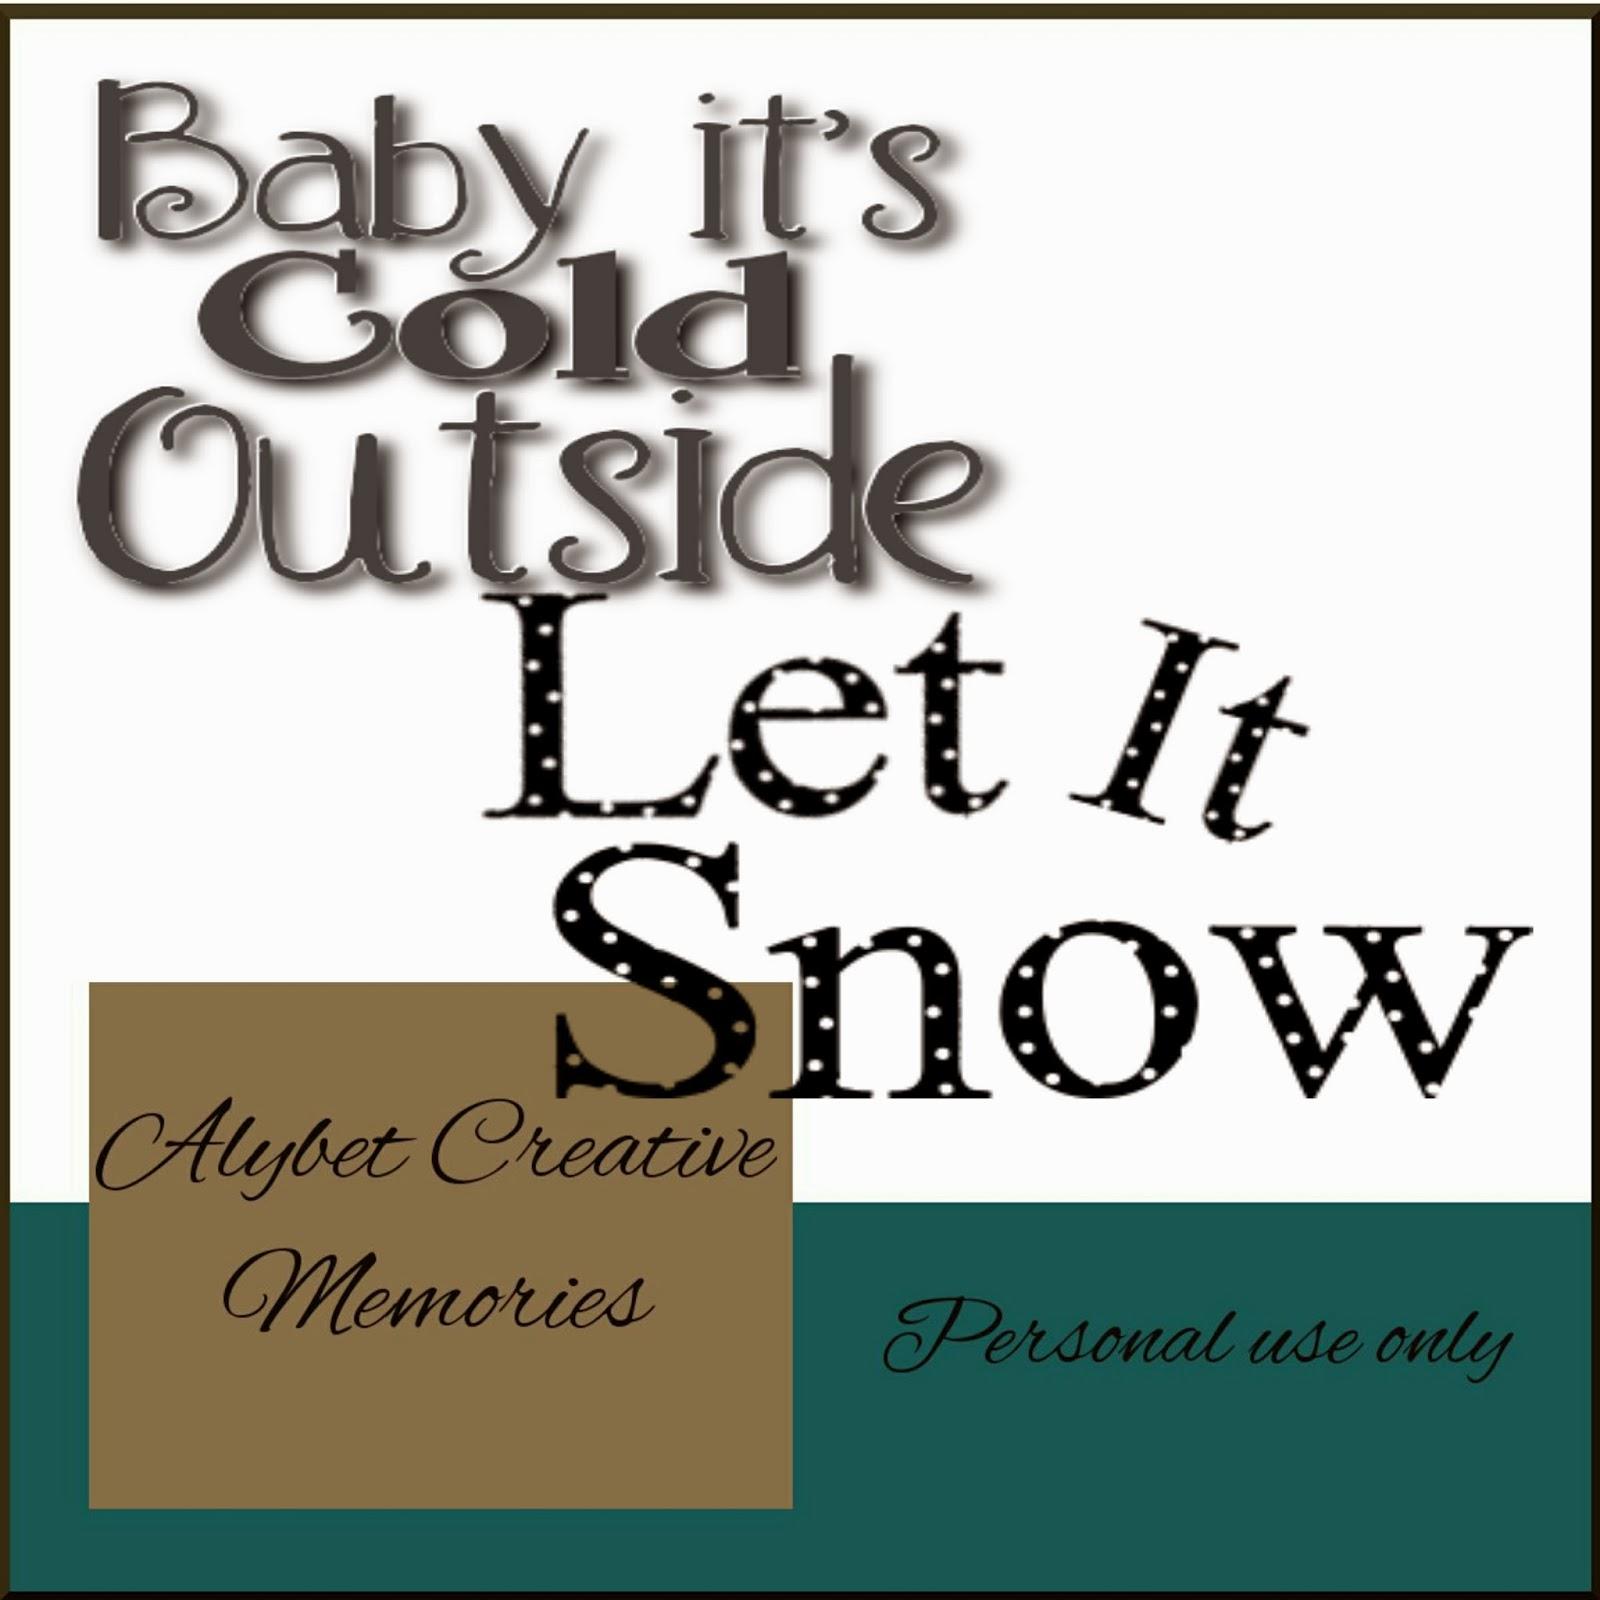 http://4.bp.blogspot.com/-rpjDkIGKIXI/UuzxS6BVXcI/AAAAAAAADYI/UdGXg3pBpPU/s1600/Snow2_alybet.jpg